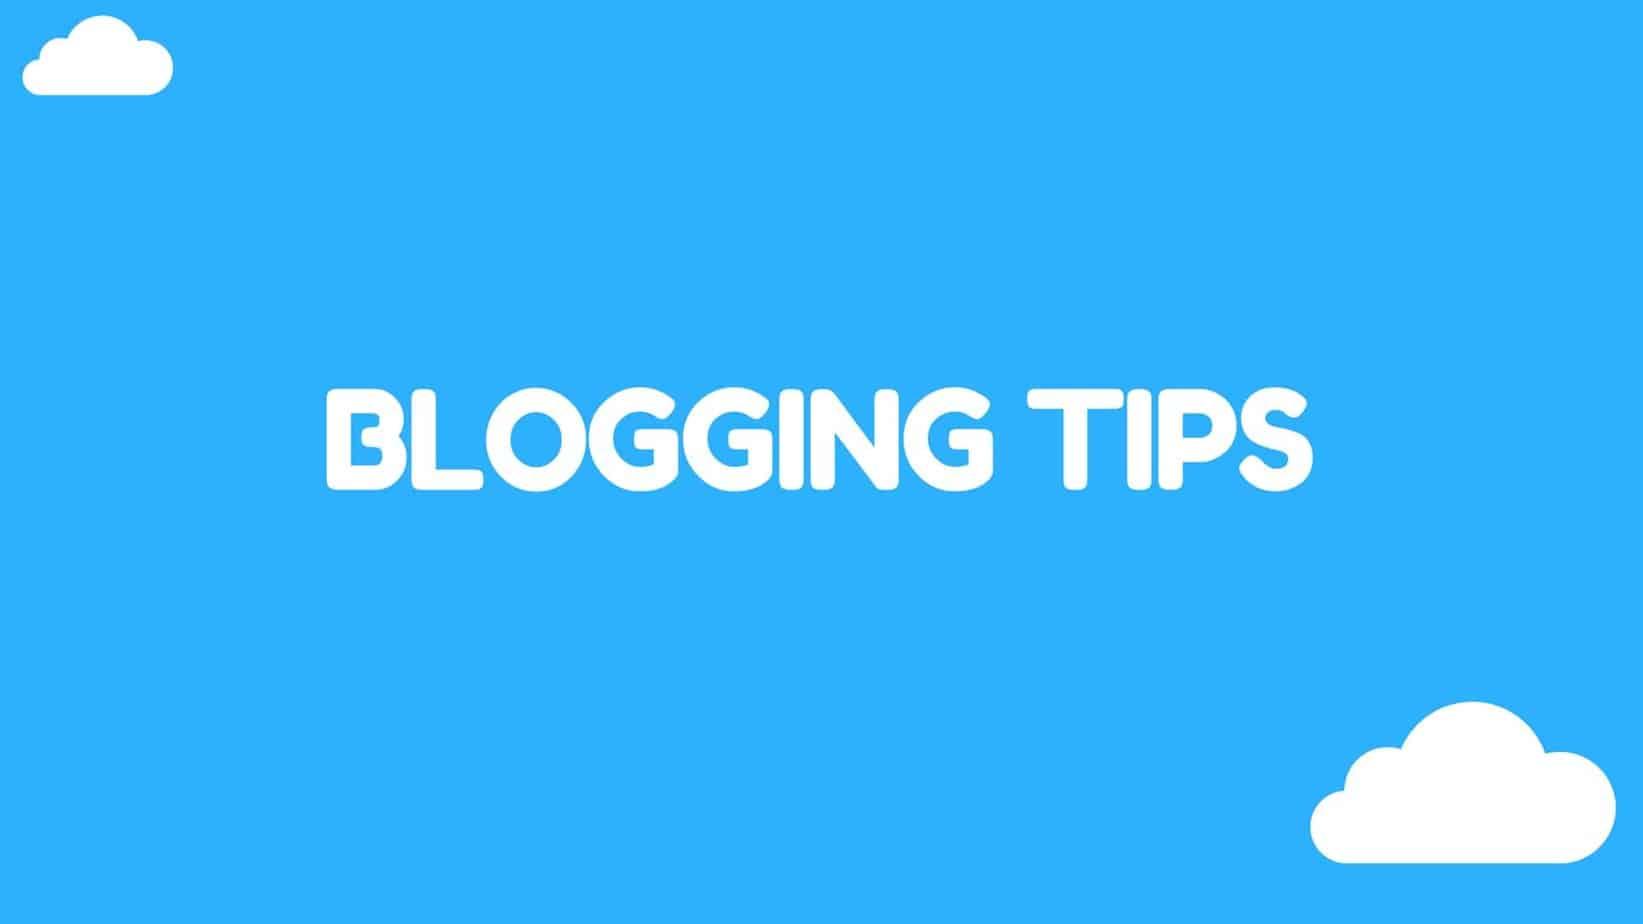 Blogging Tips For Beginners And Make Money Online 2020